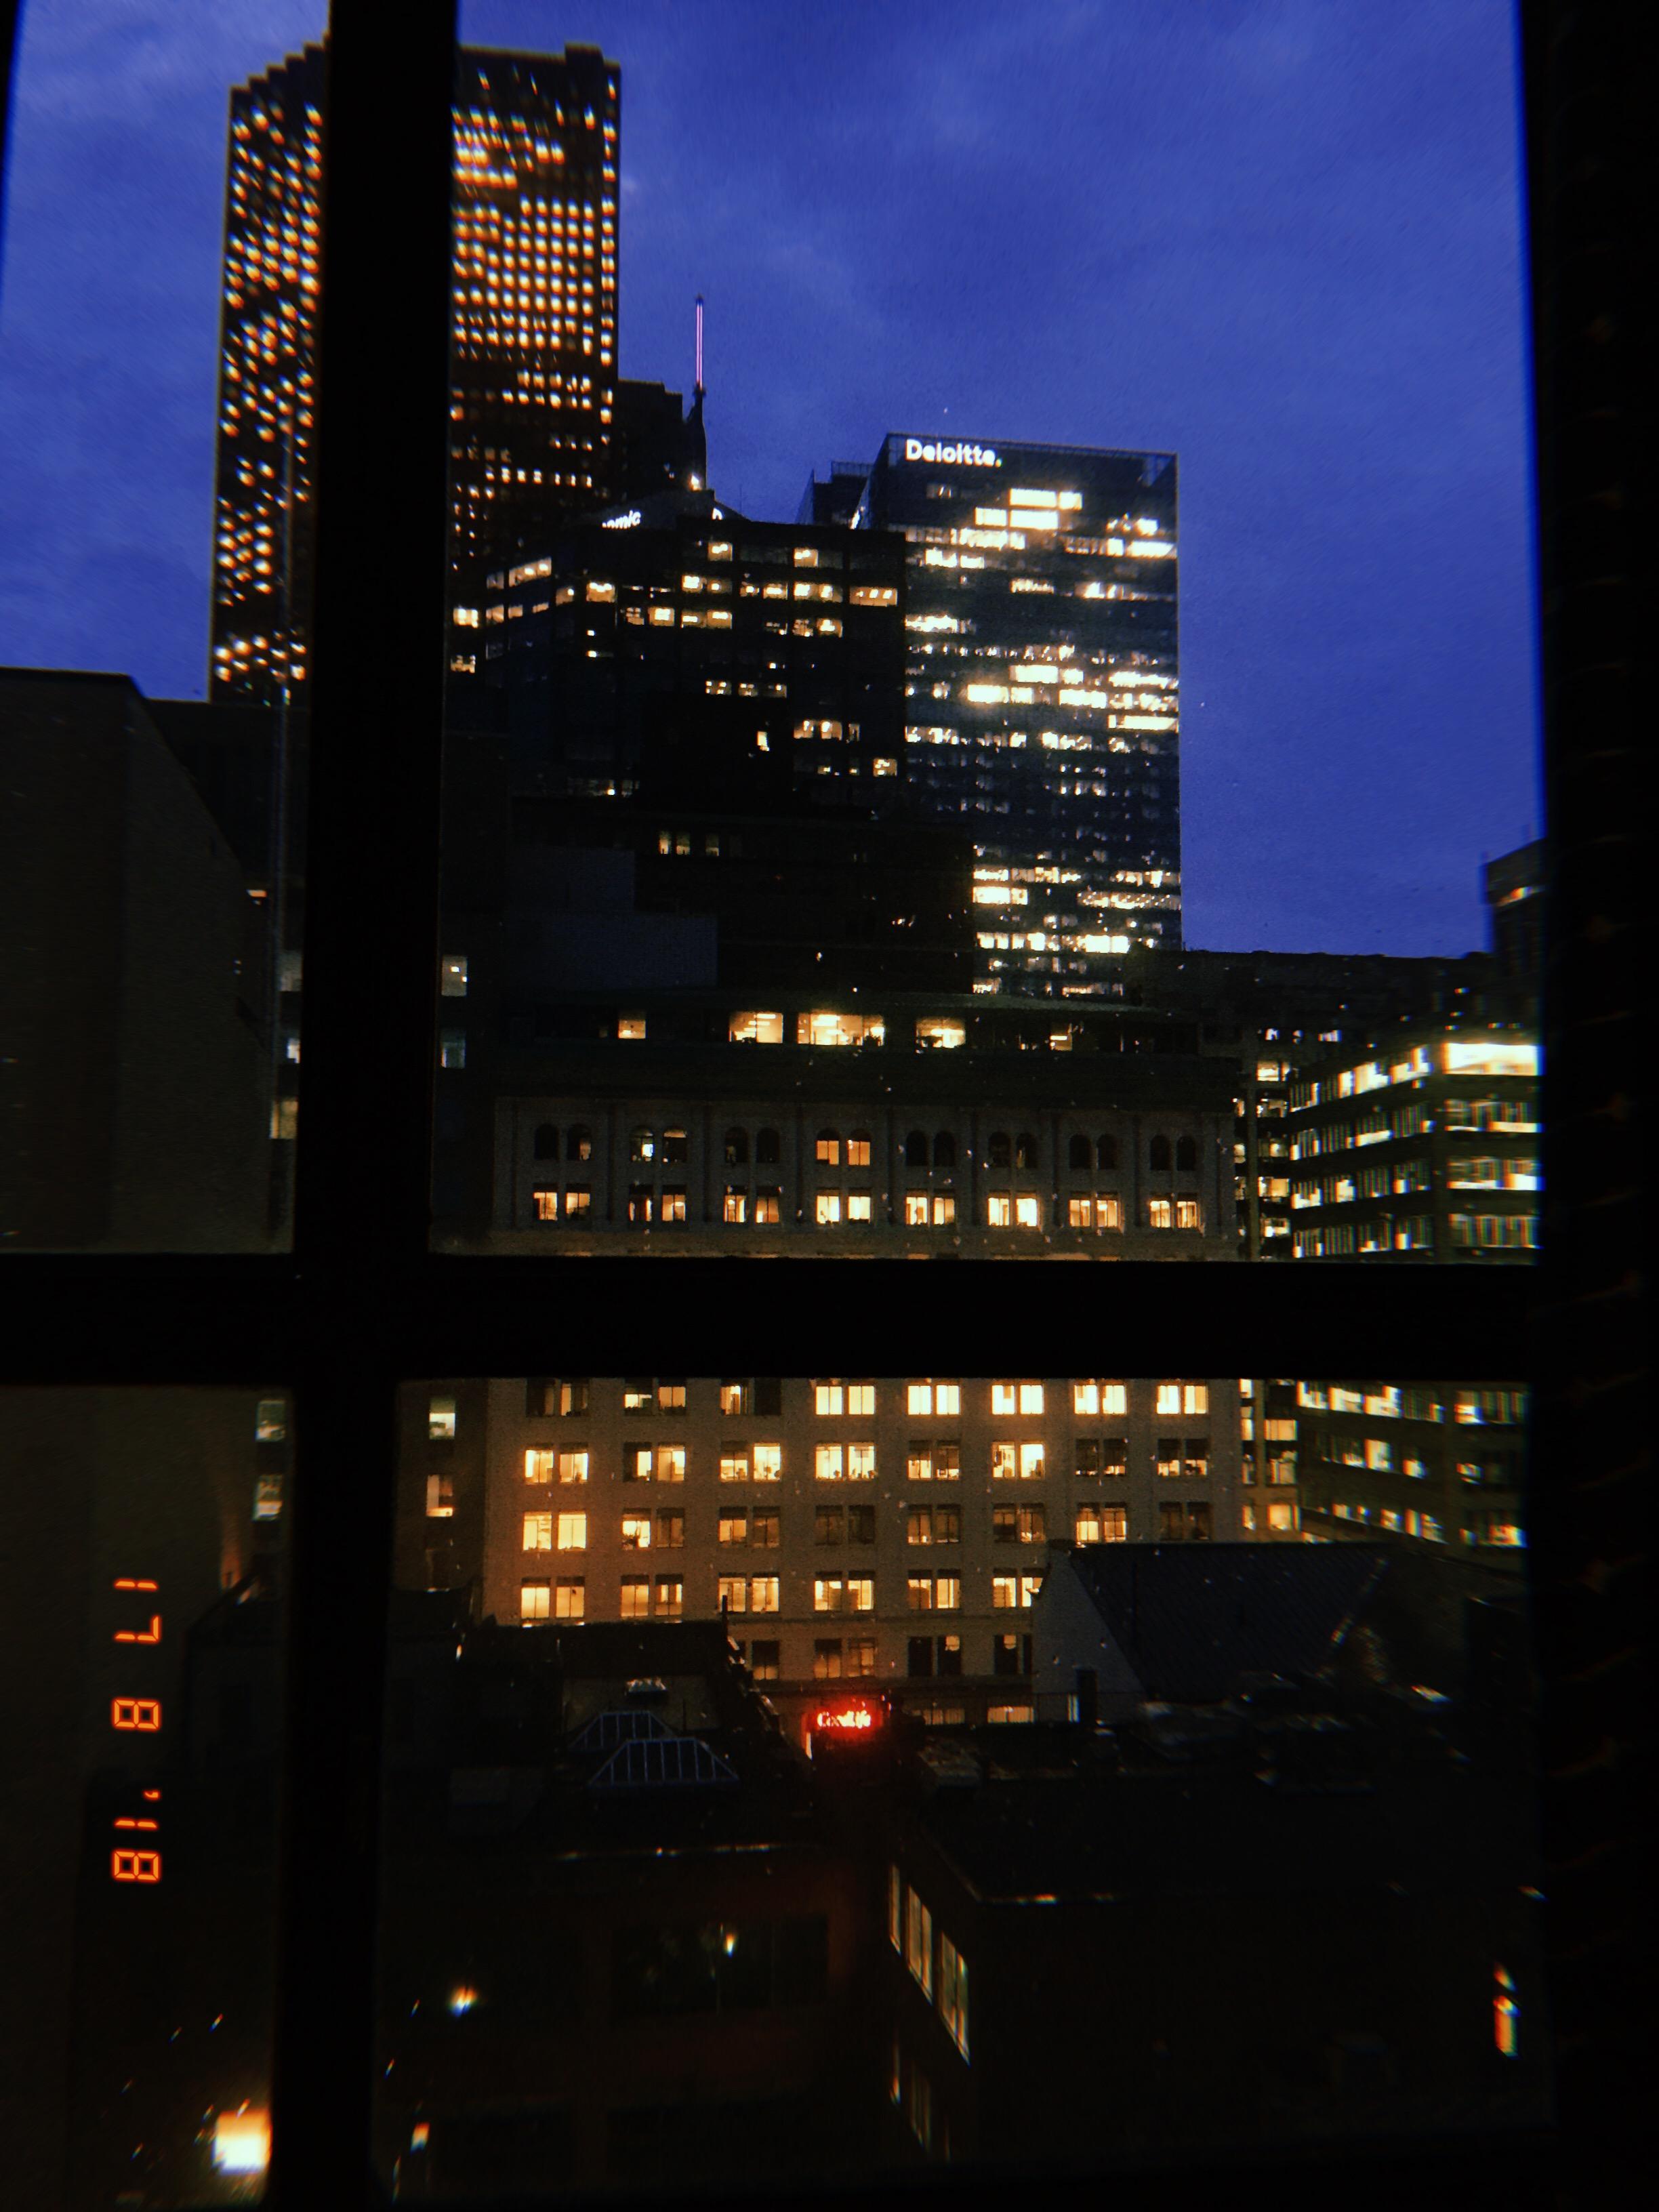 Toronto at night (18/08/17)